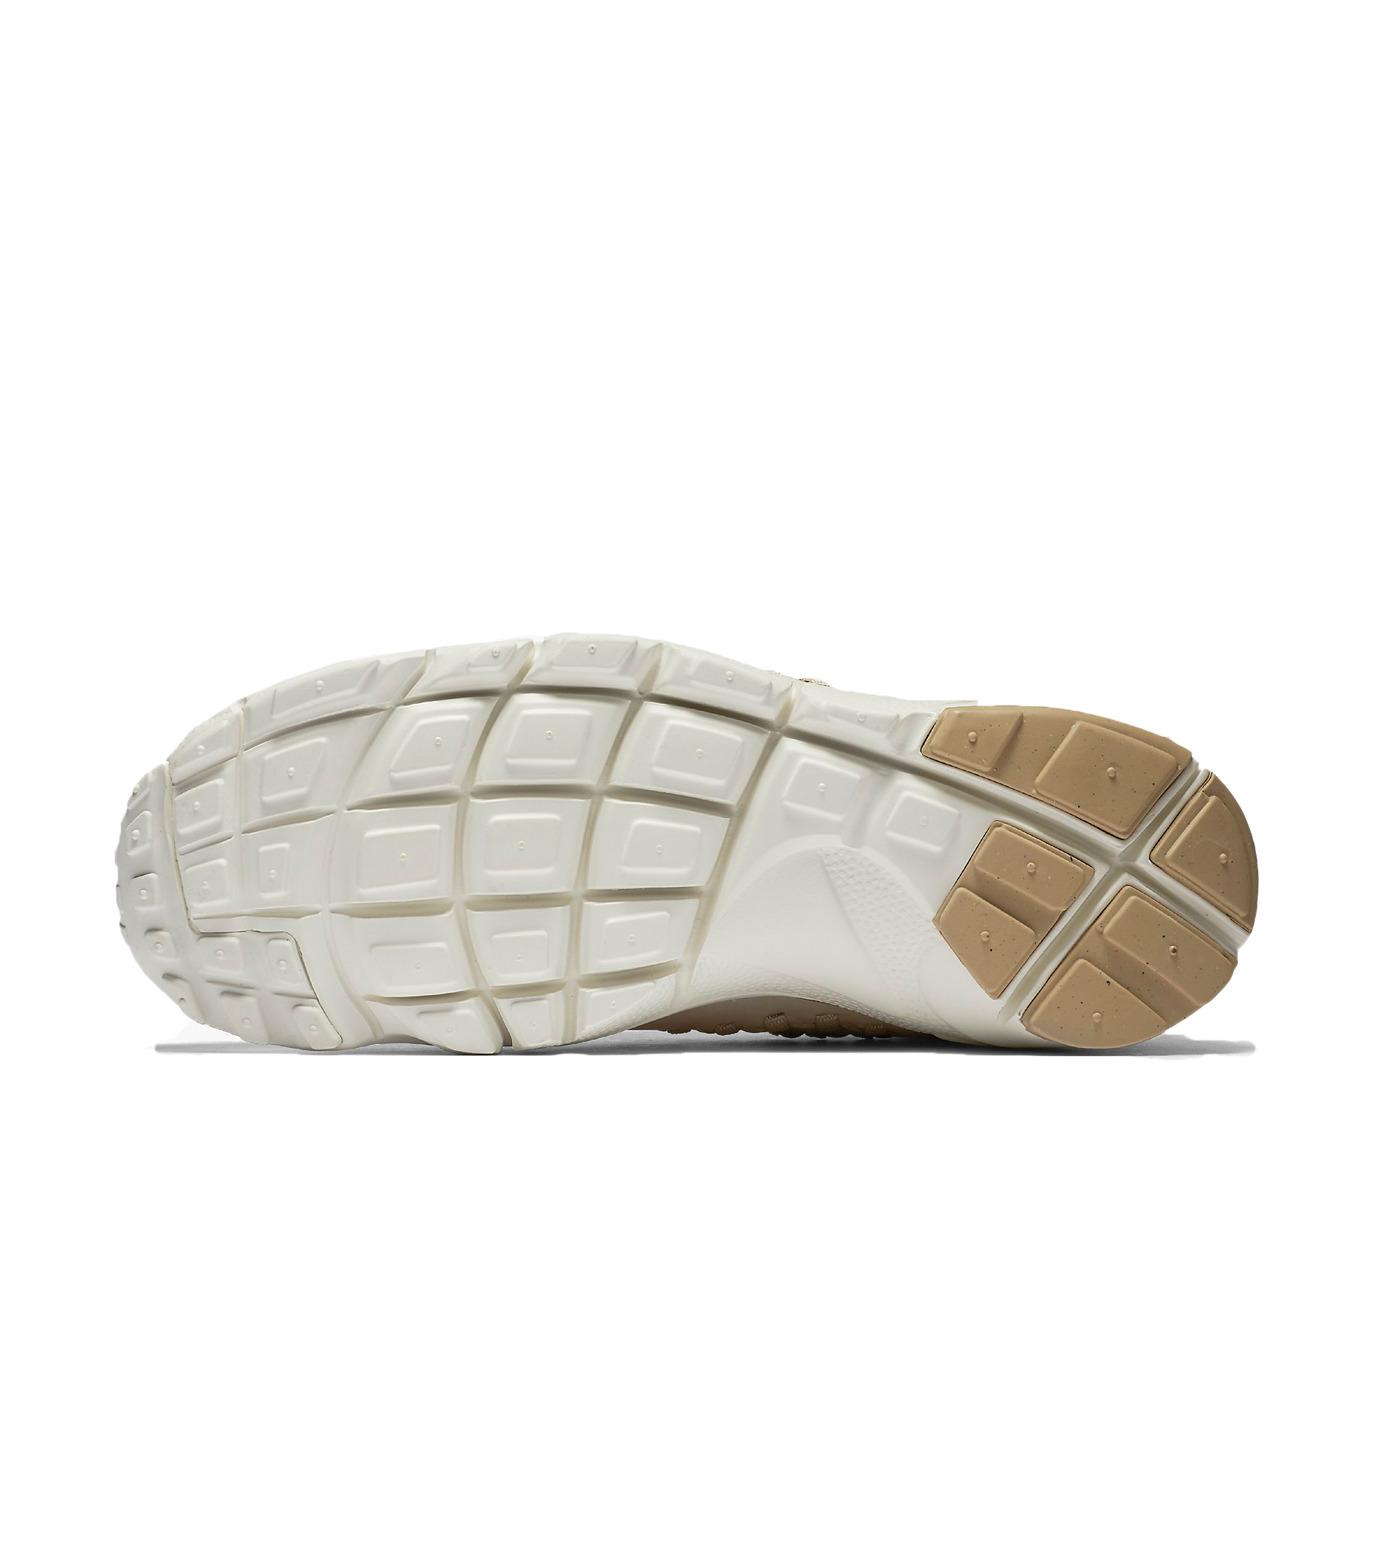 NIKE(ナイキ)のAIR FOOTSCAPE WOVEN NM-LIGHT BEIGE(シューズ/shoes)-874892-200-51 拡大詳細画像2